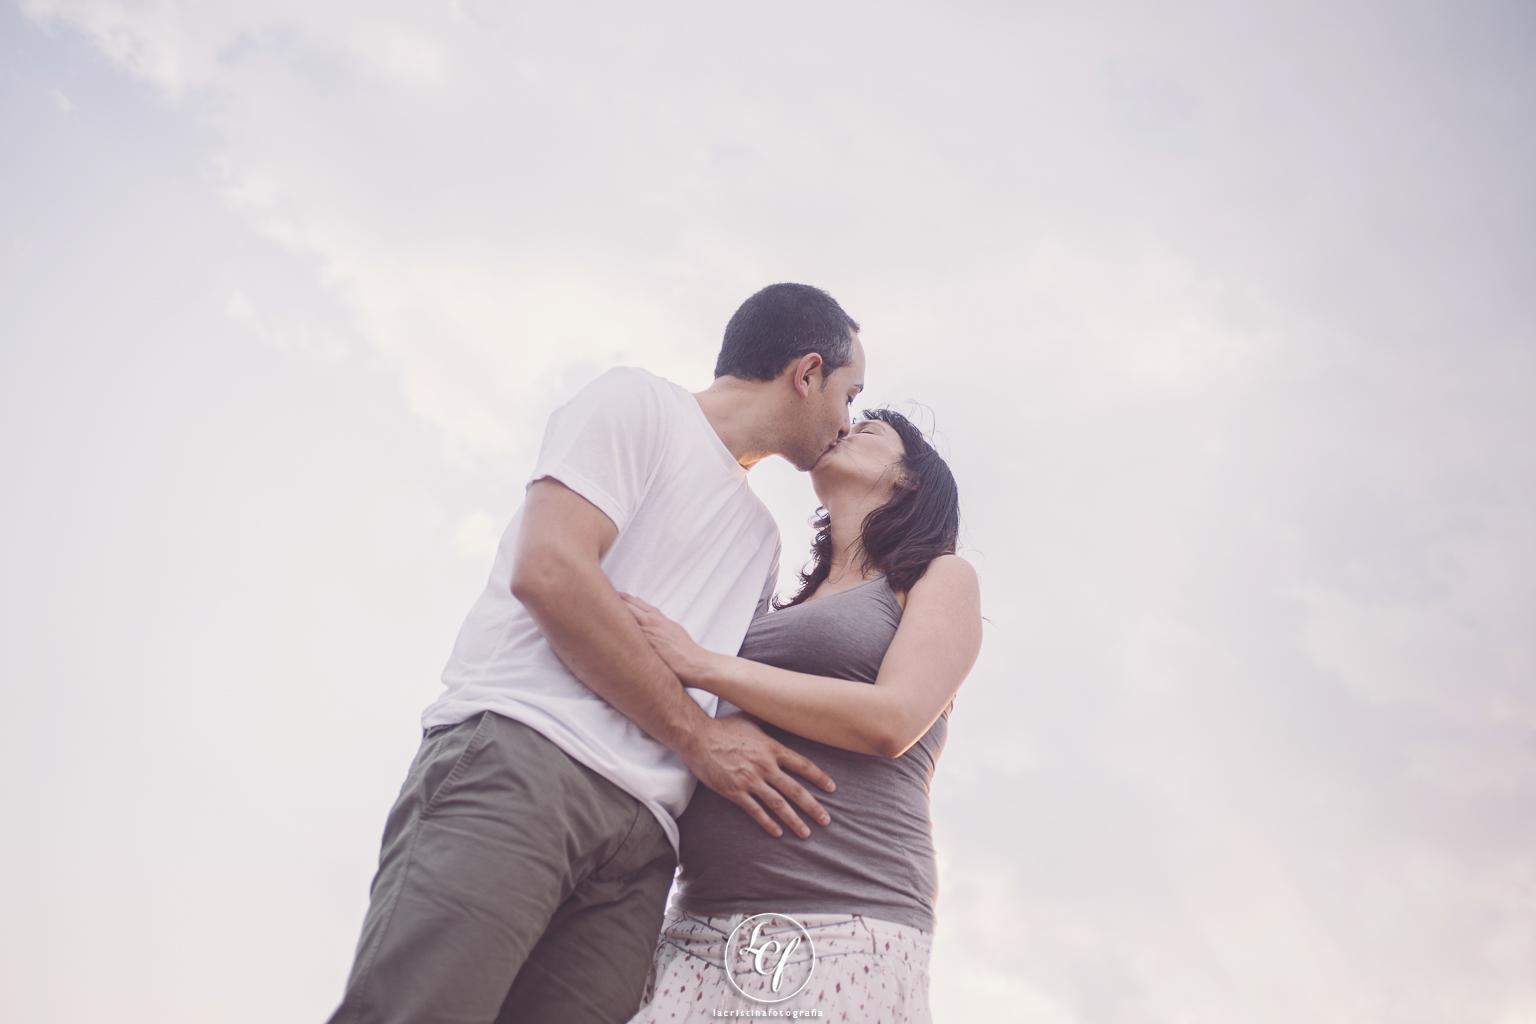 fotógrafo de embarazo :: fotógrafa embarazo :: fotografía embarazada :: fotografía embarazada en la playa :: fotografía embarazada barcelona